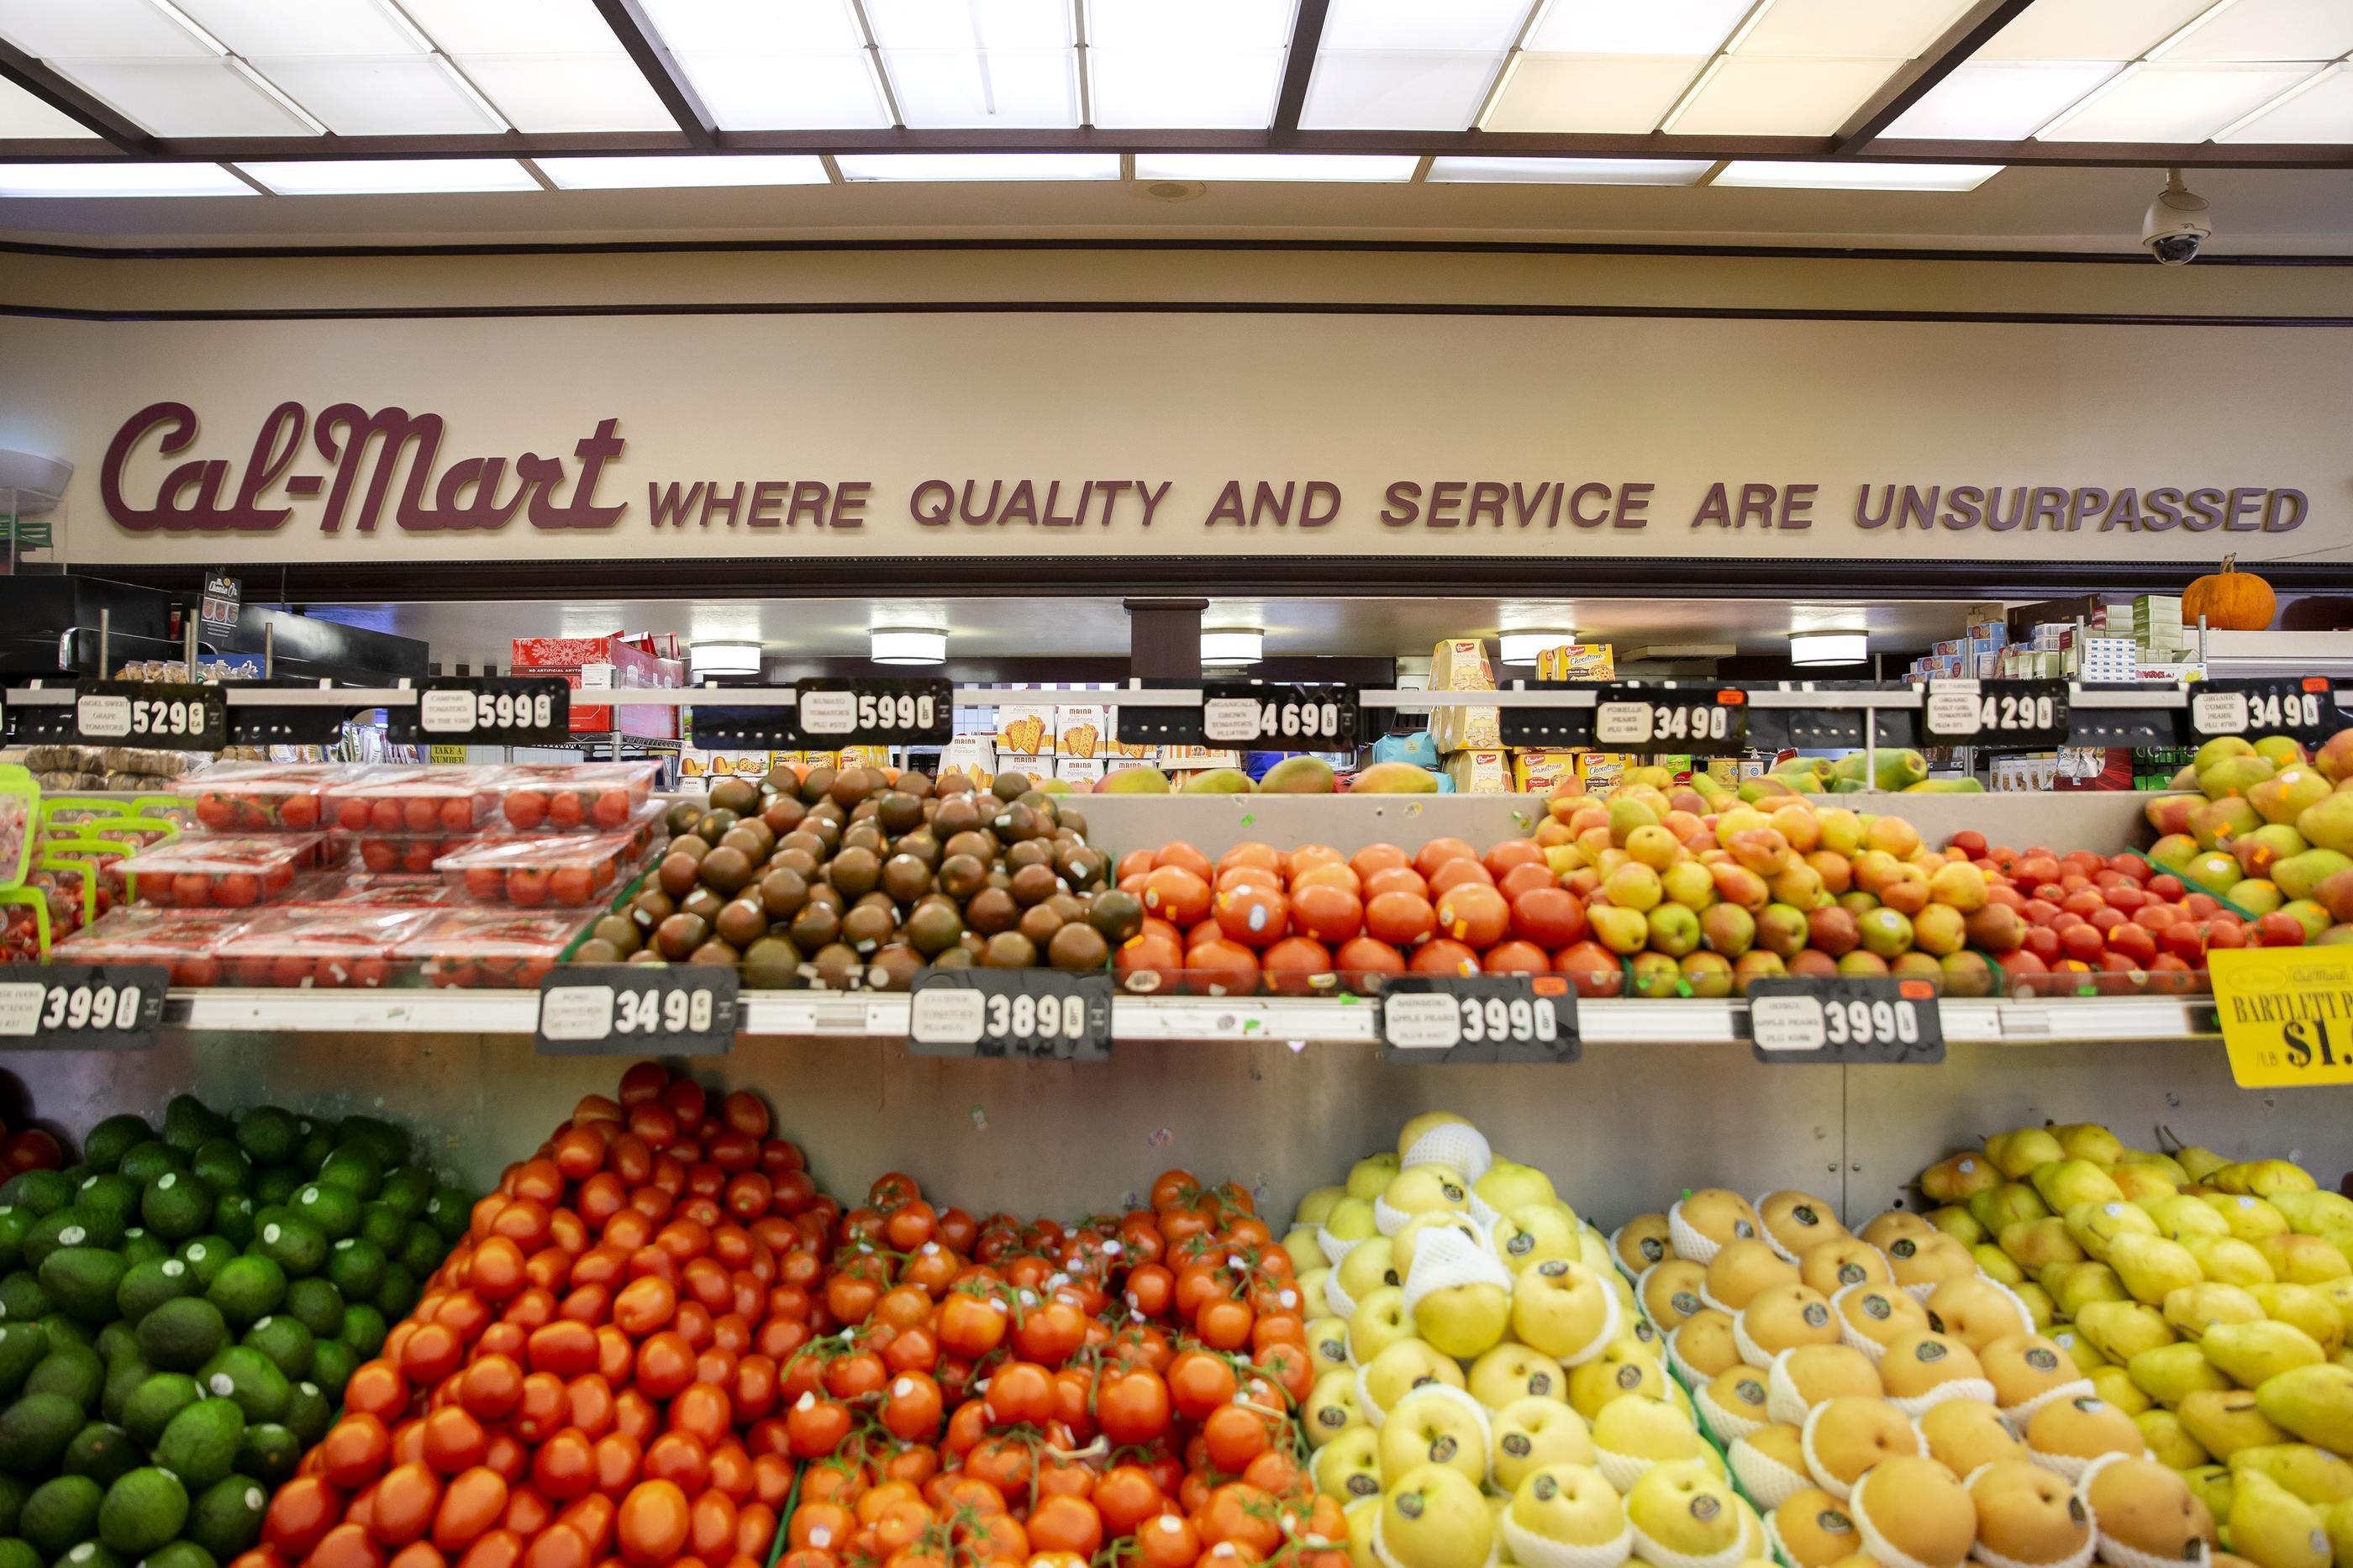 Gallery & Testimonial – Cal-Mart Supermarket in San Francisco, CA